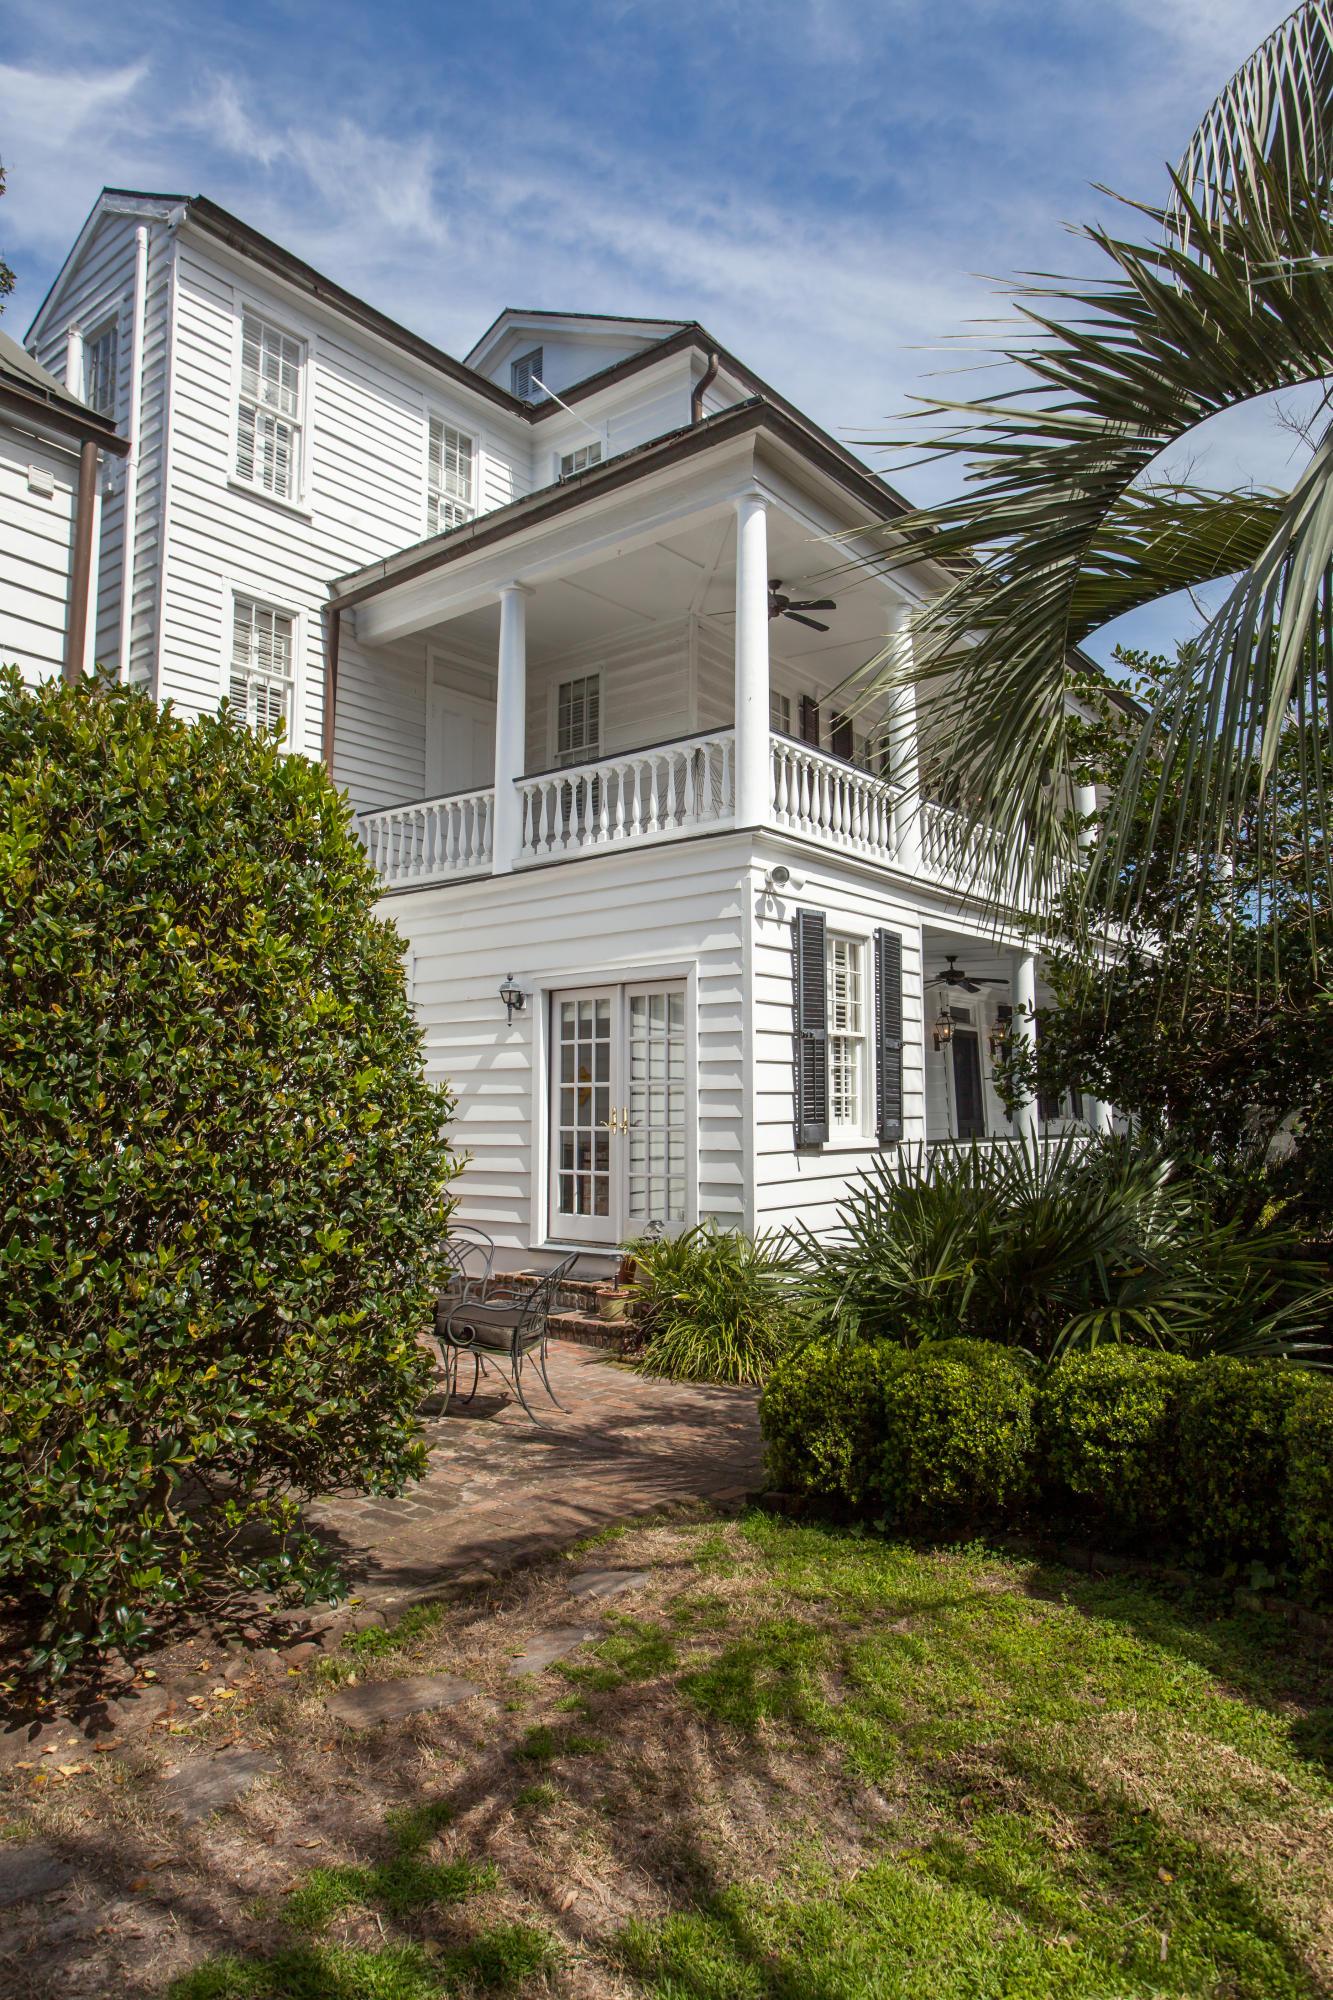 Ansonborough Homes For Sale - 5 Alexander, Charleston, SC - 66